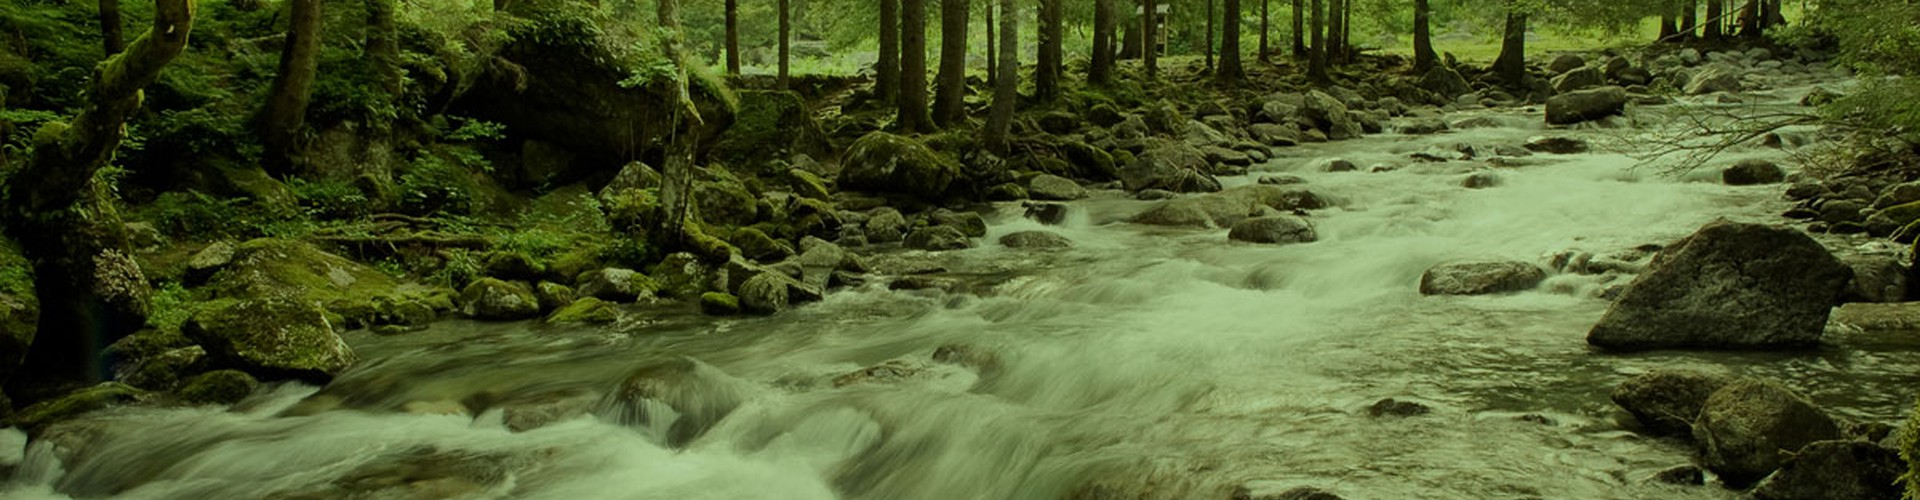 Masino river (Credit: Christian Massari, distributed via imaggeo.egu.eu)